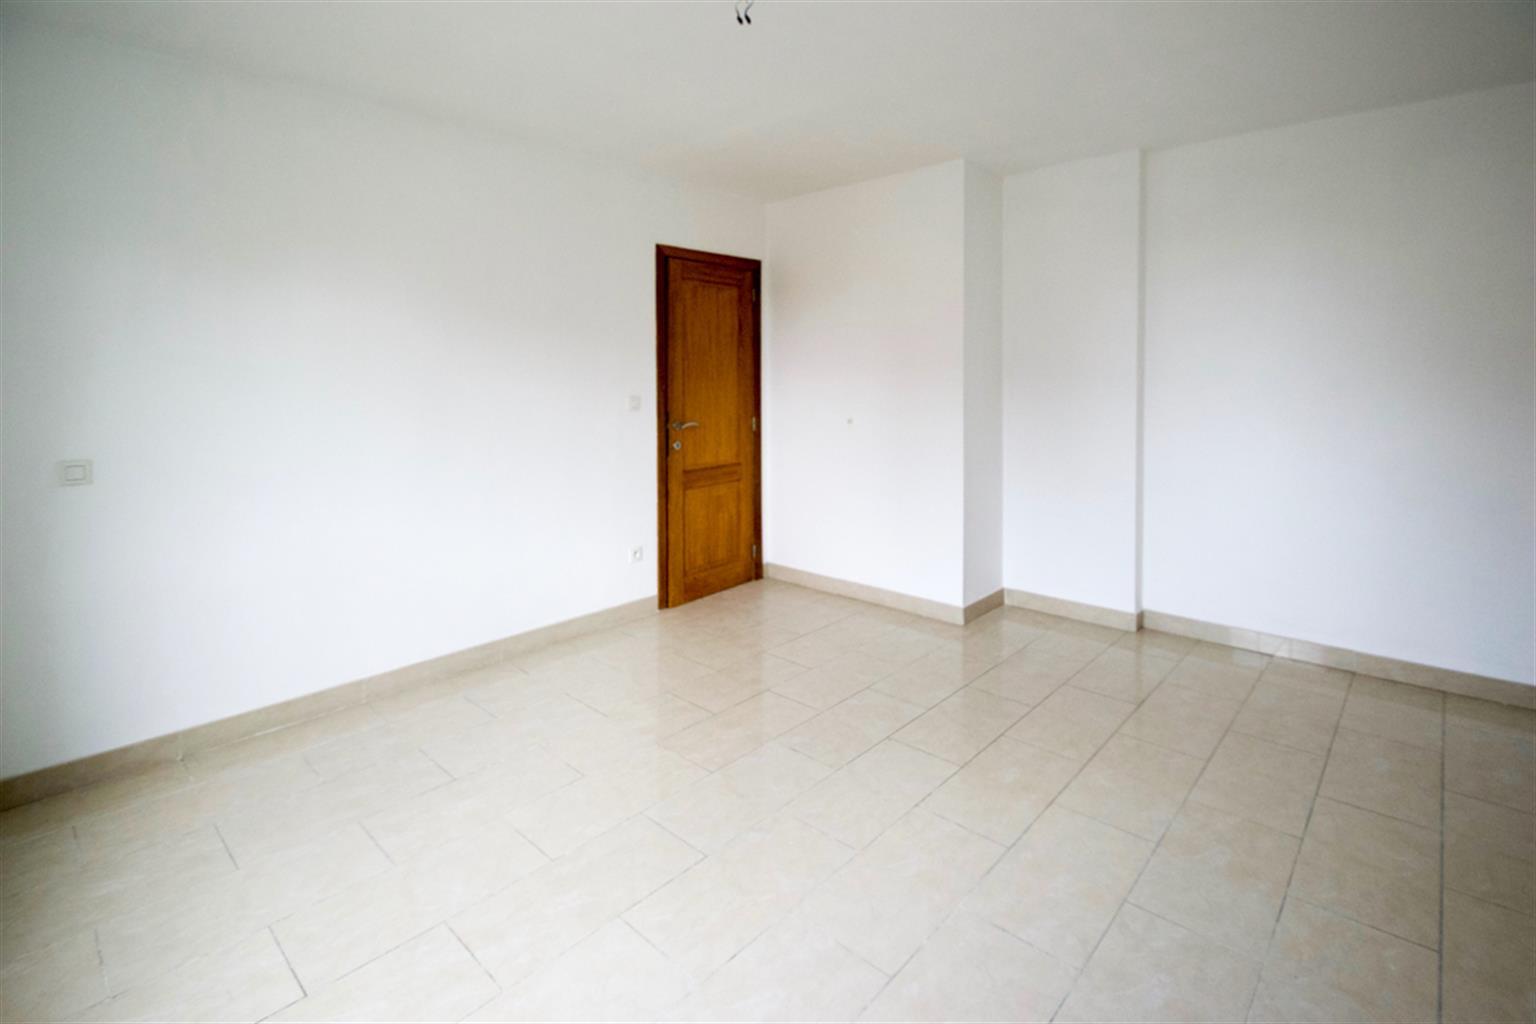 Appartement - Binche Leval-Trahegnies - #3269650-4